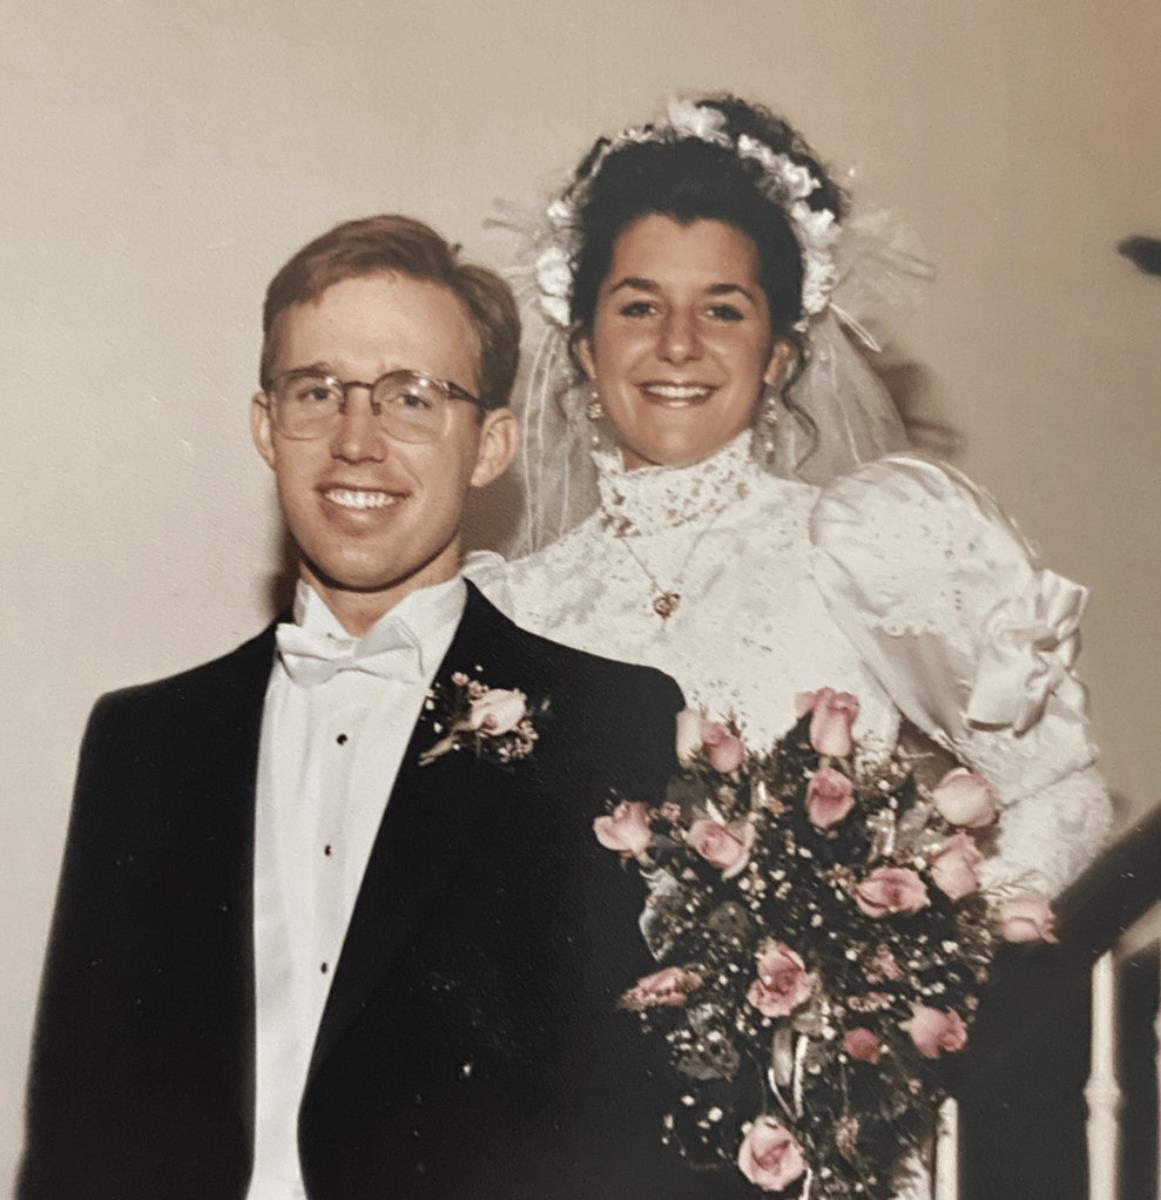 4. Sonja and Mitch's Wedding